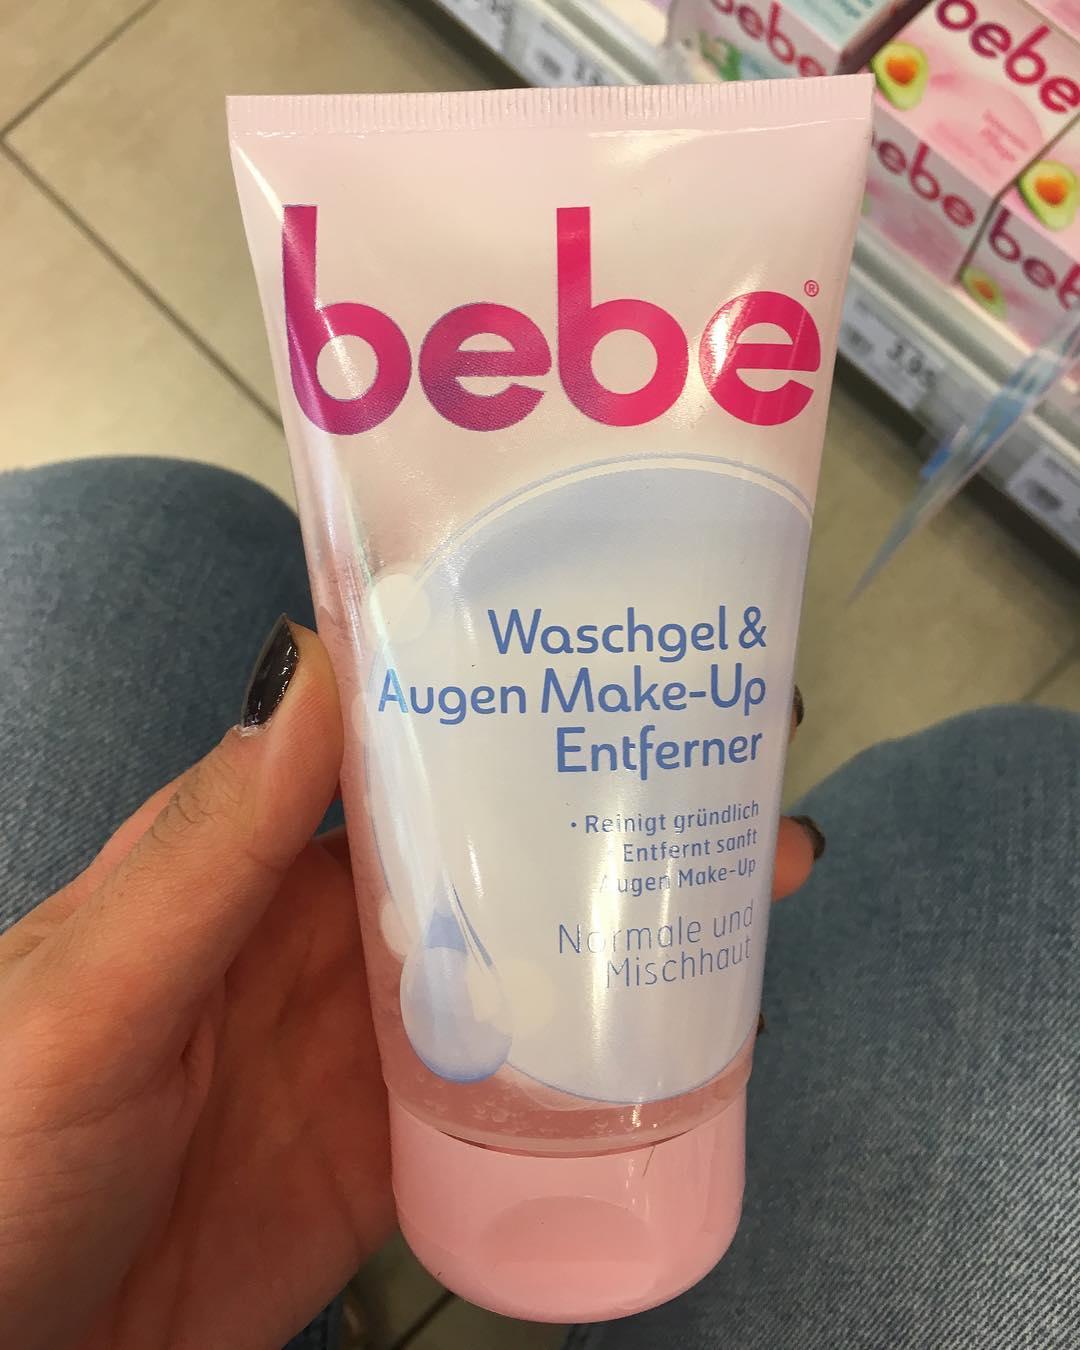 Sữa rửa mặt  kết hợp tẩy trang Bebe young care